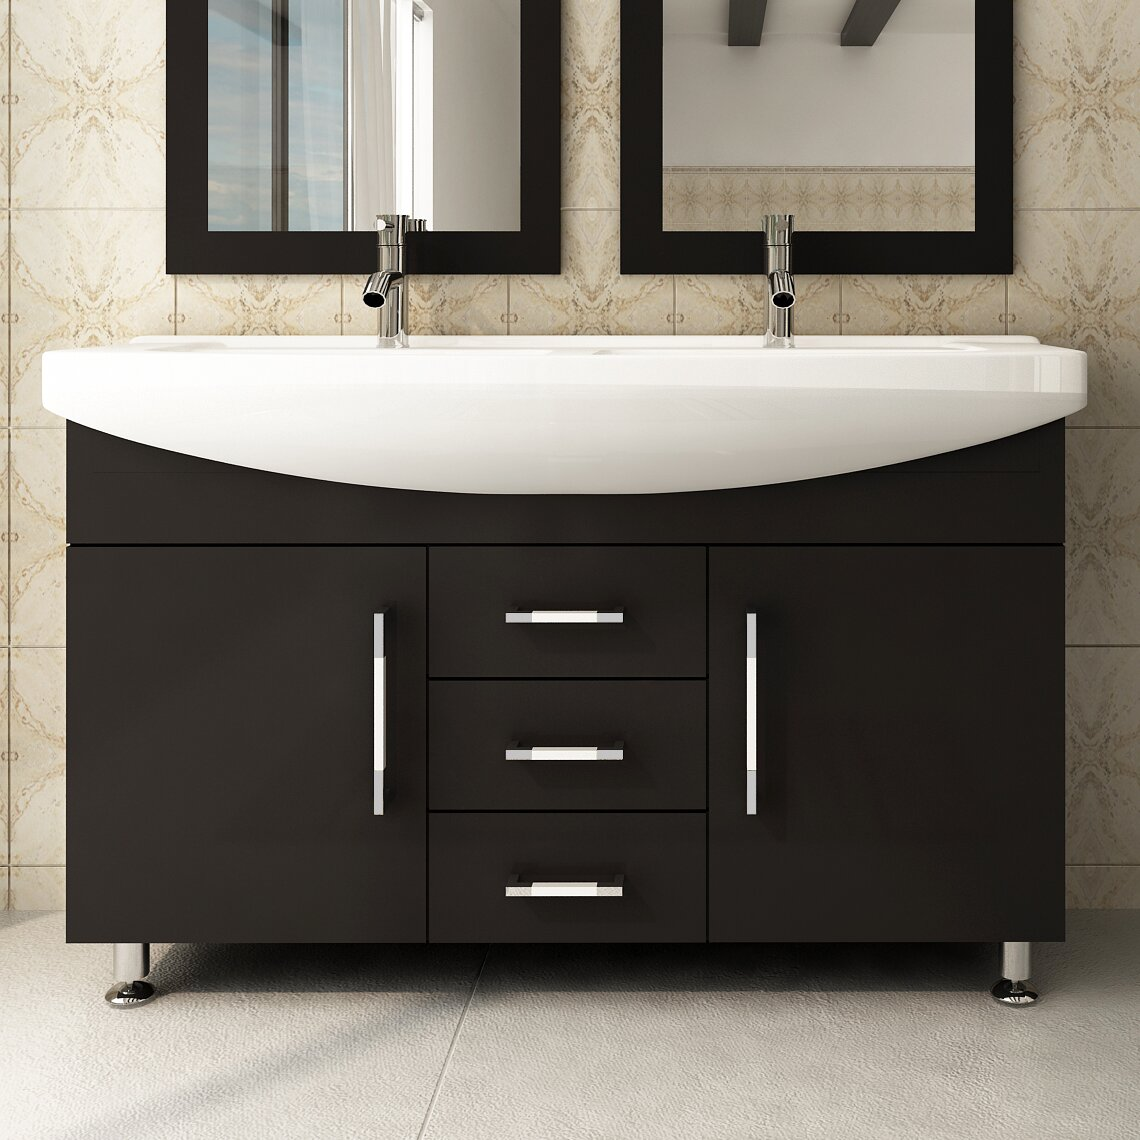 Double bathroom vanity - Celine 48 Double Bathroom Vanity Set